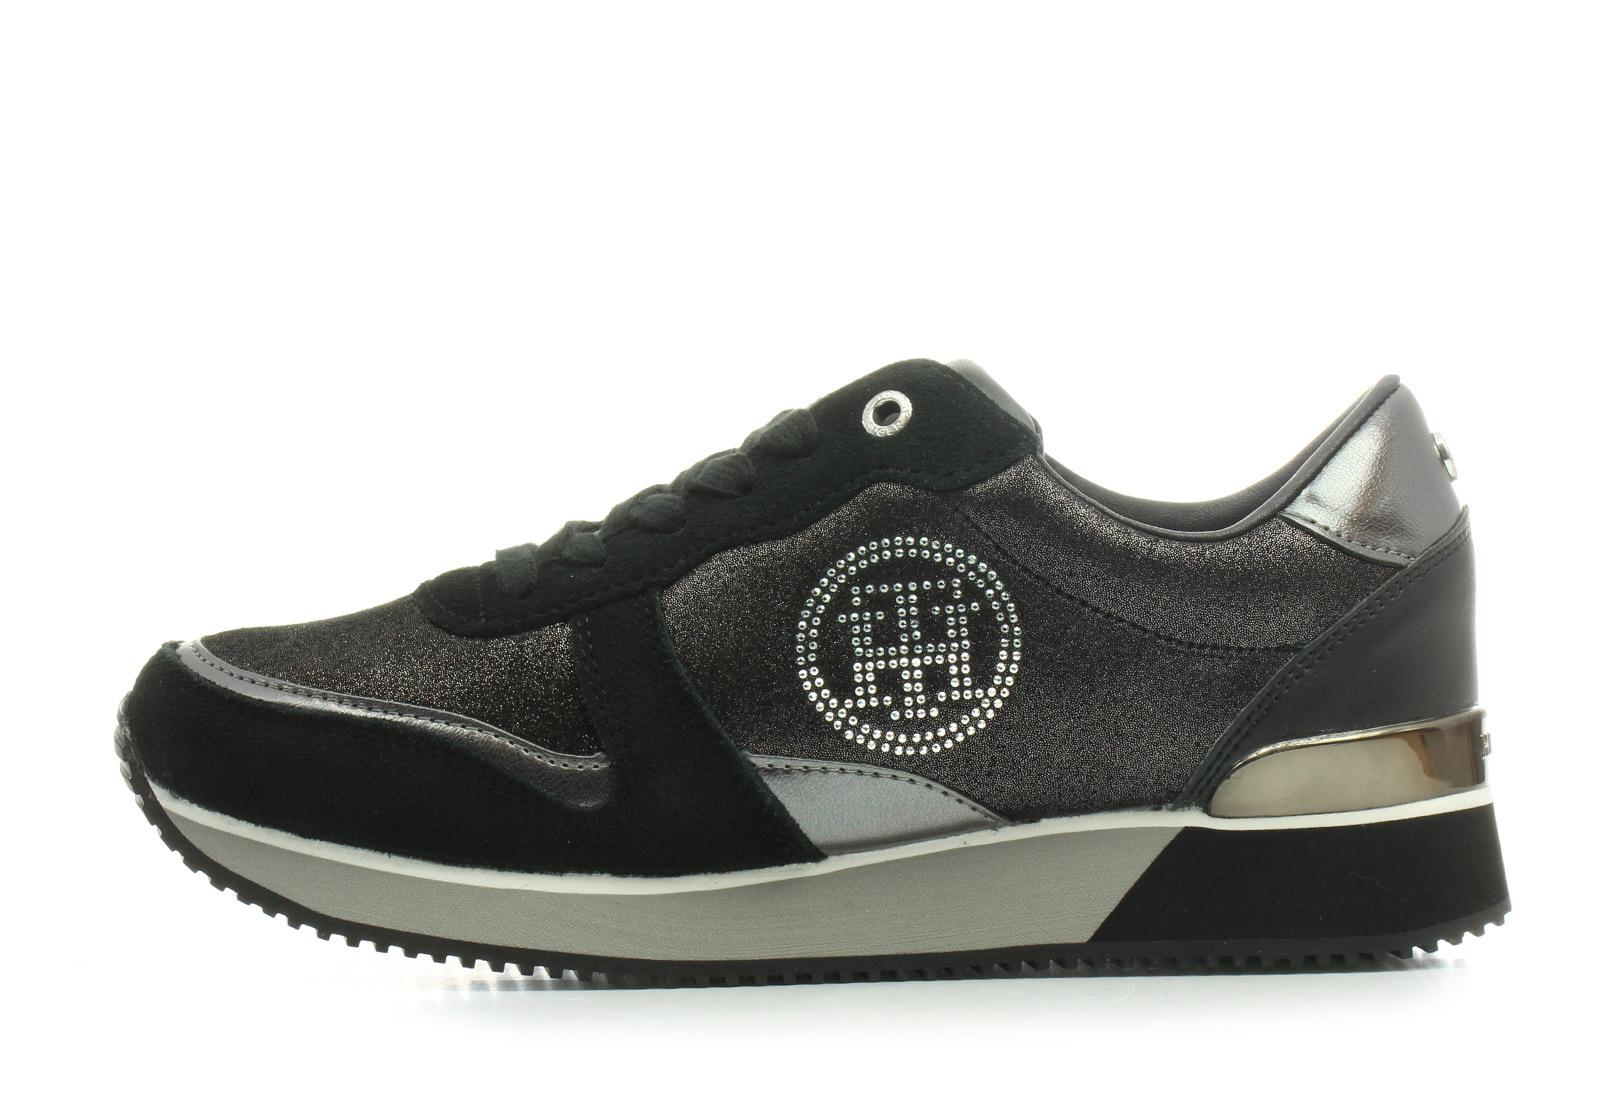 Tommy Hilfiger Shoes - Annie 2d - 18F-3229-990 - Online shop for ... 4f1a14bb618